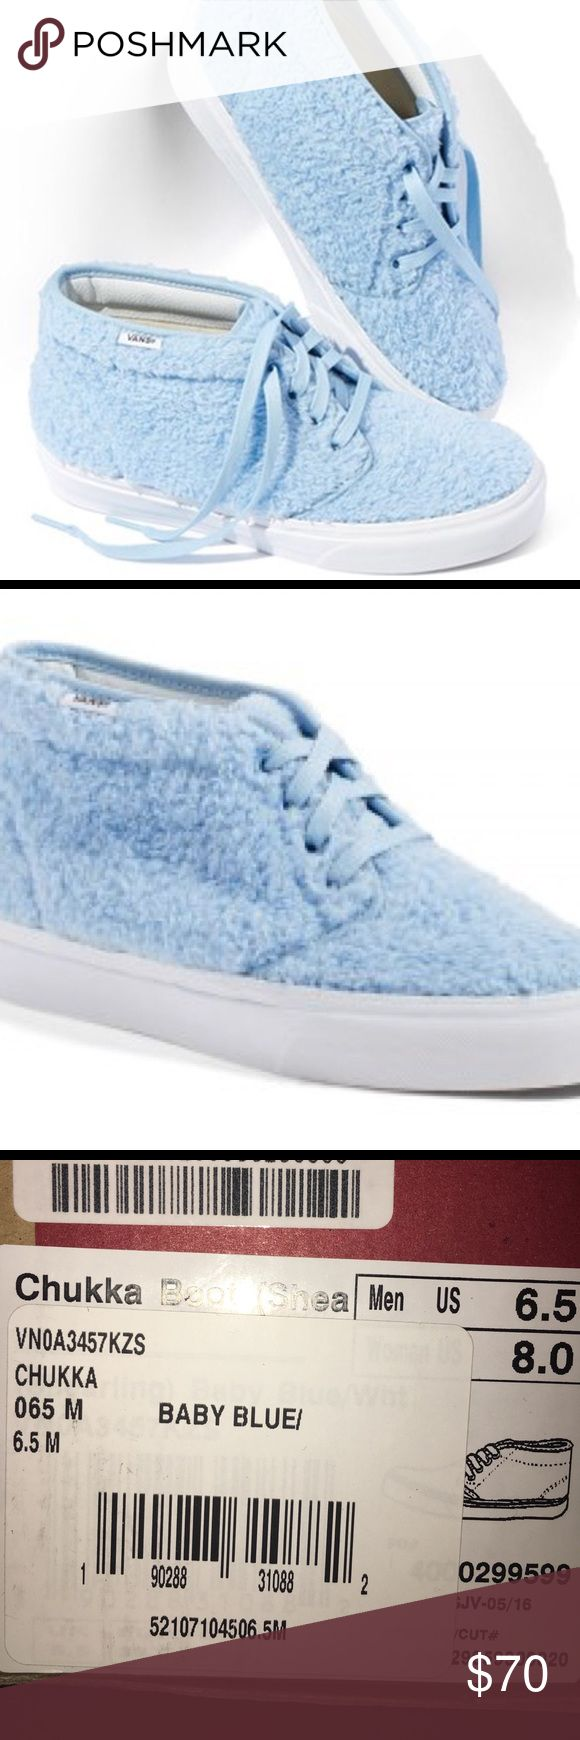 NordstromxVans: Chukka Sneaker (Faux Shearing) New. Never worn Chukka Fuzzy High top Vans. Vans Shoes Sneakers